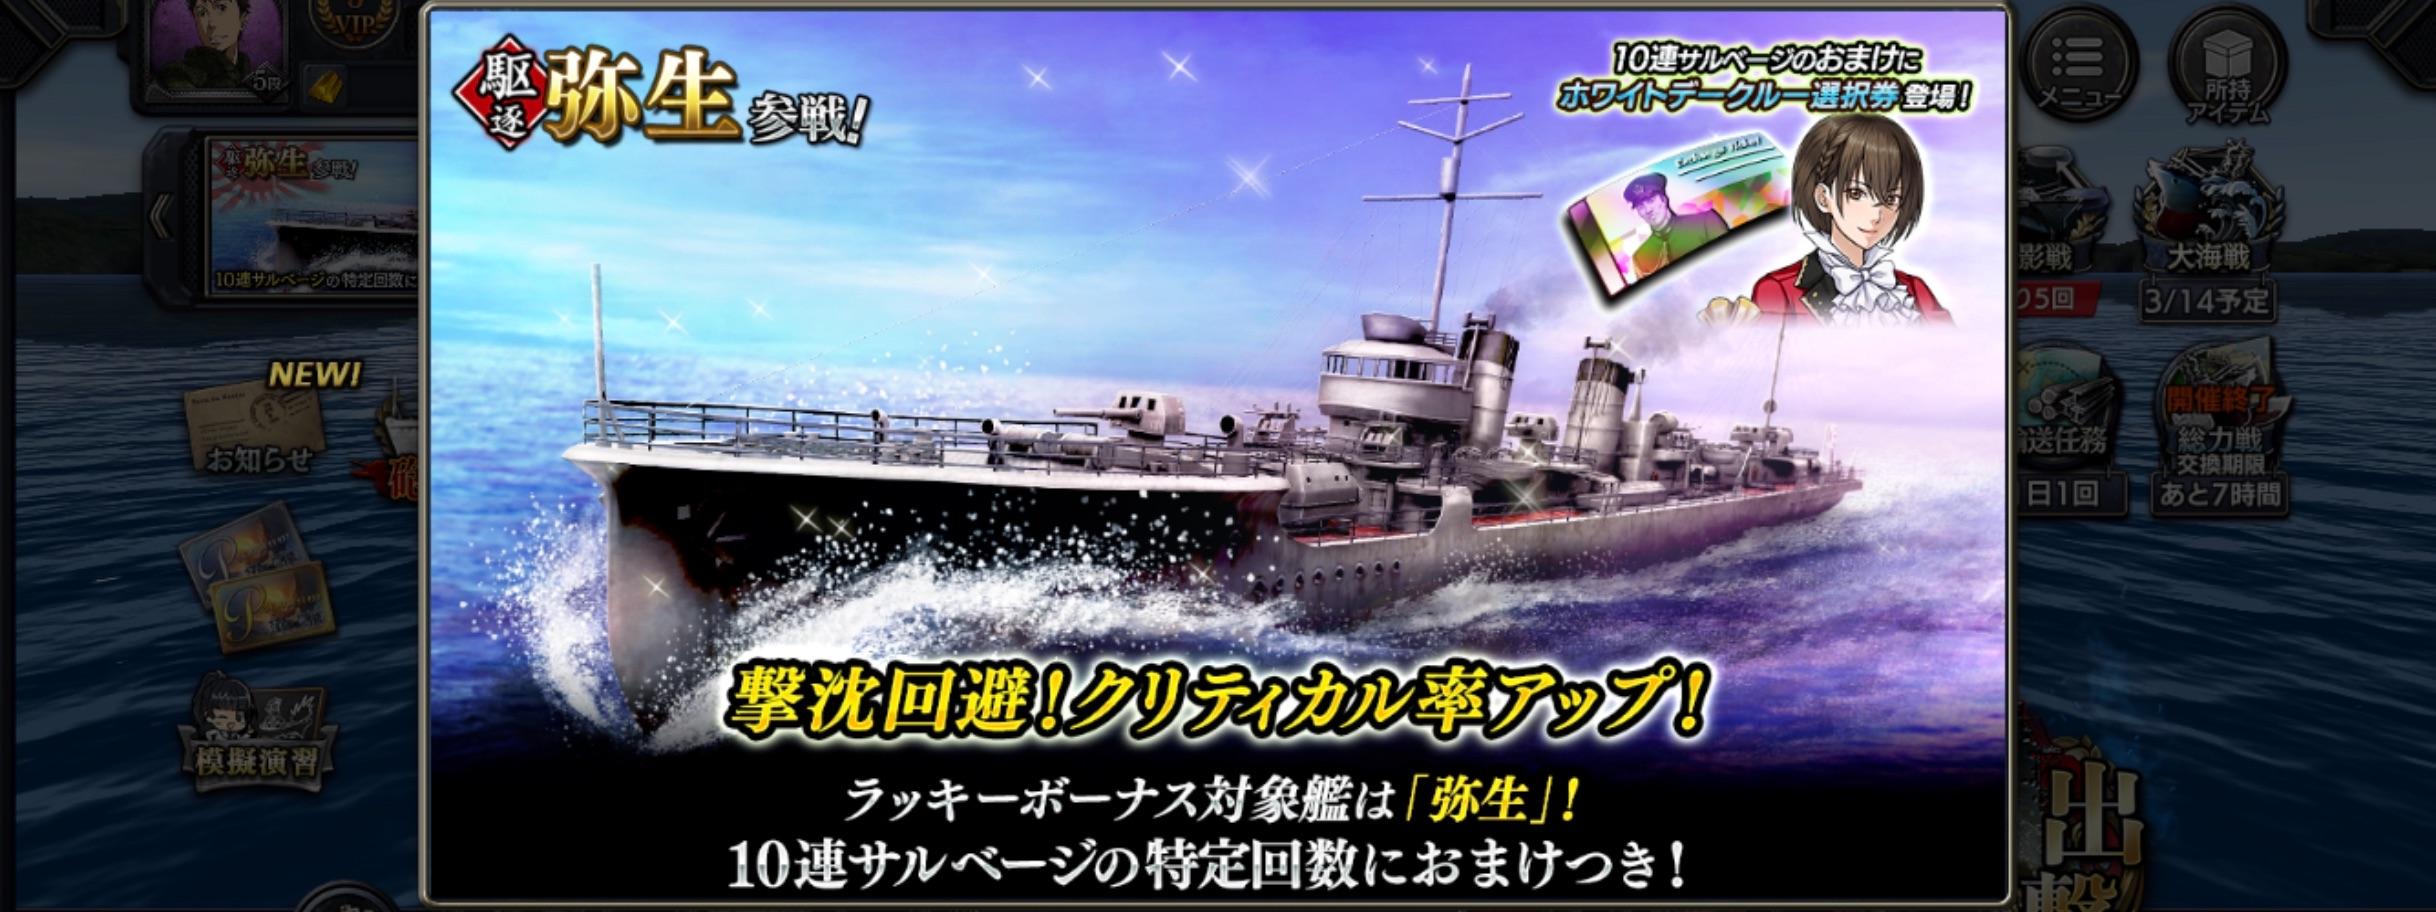 destroyer-yayoi